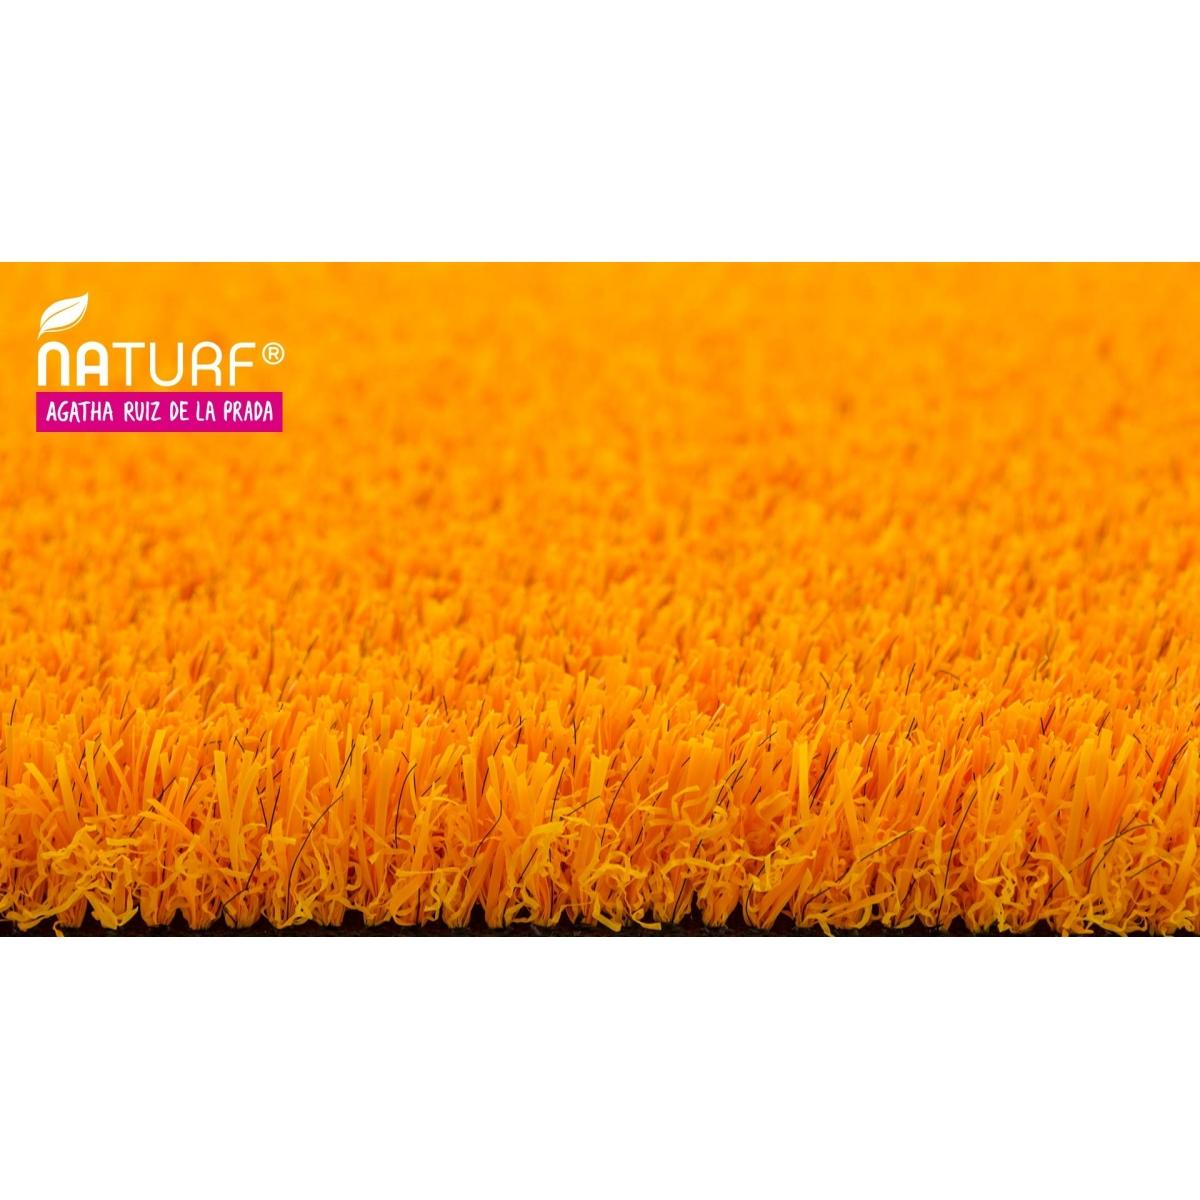 Naturf Cesped artificial Naranja Serie Agatha